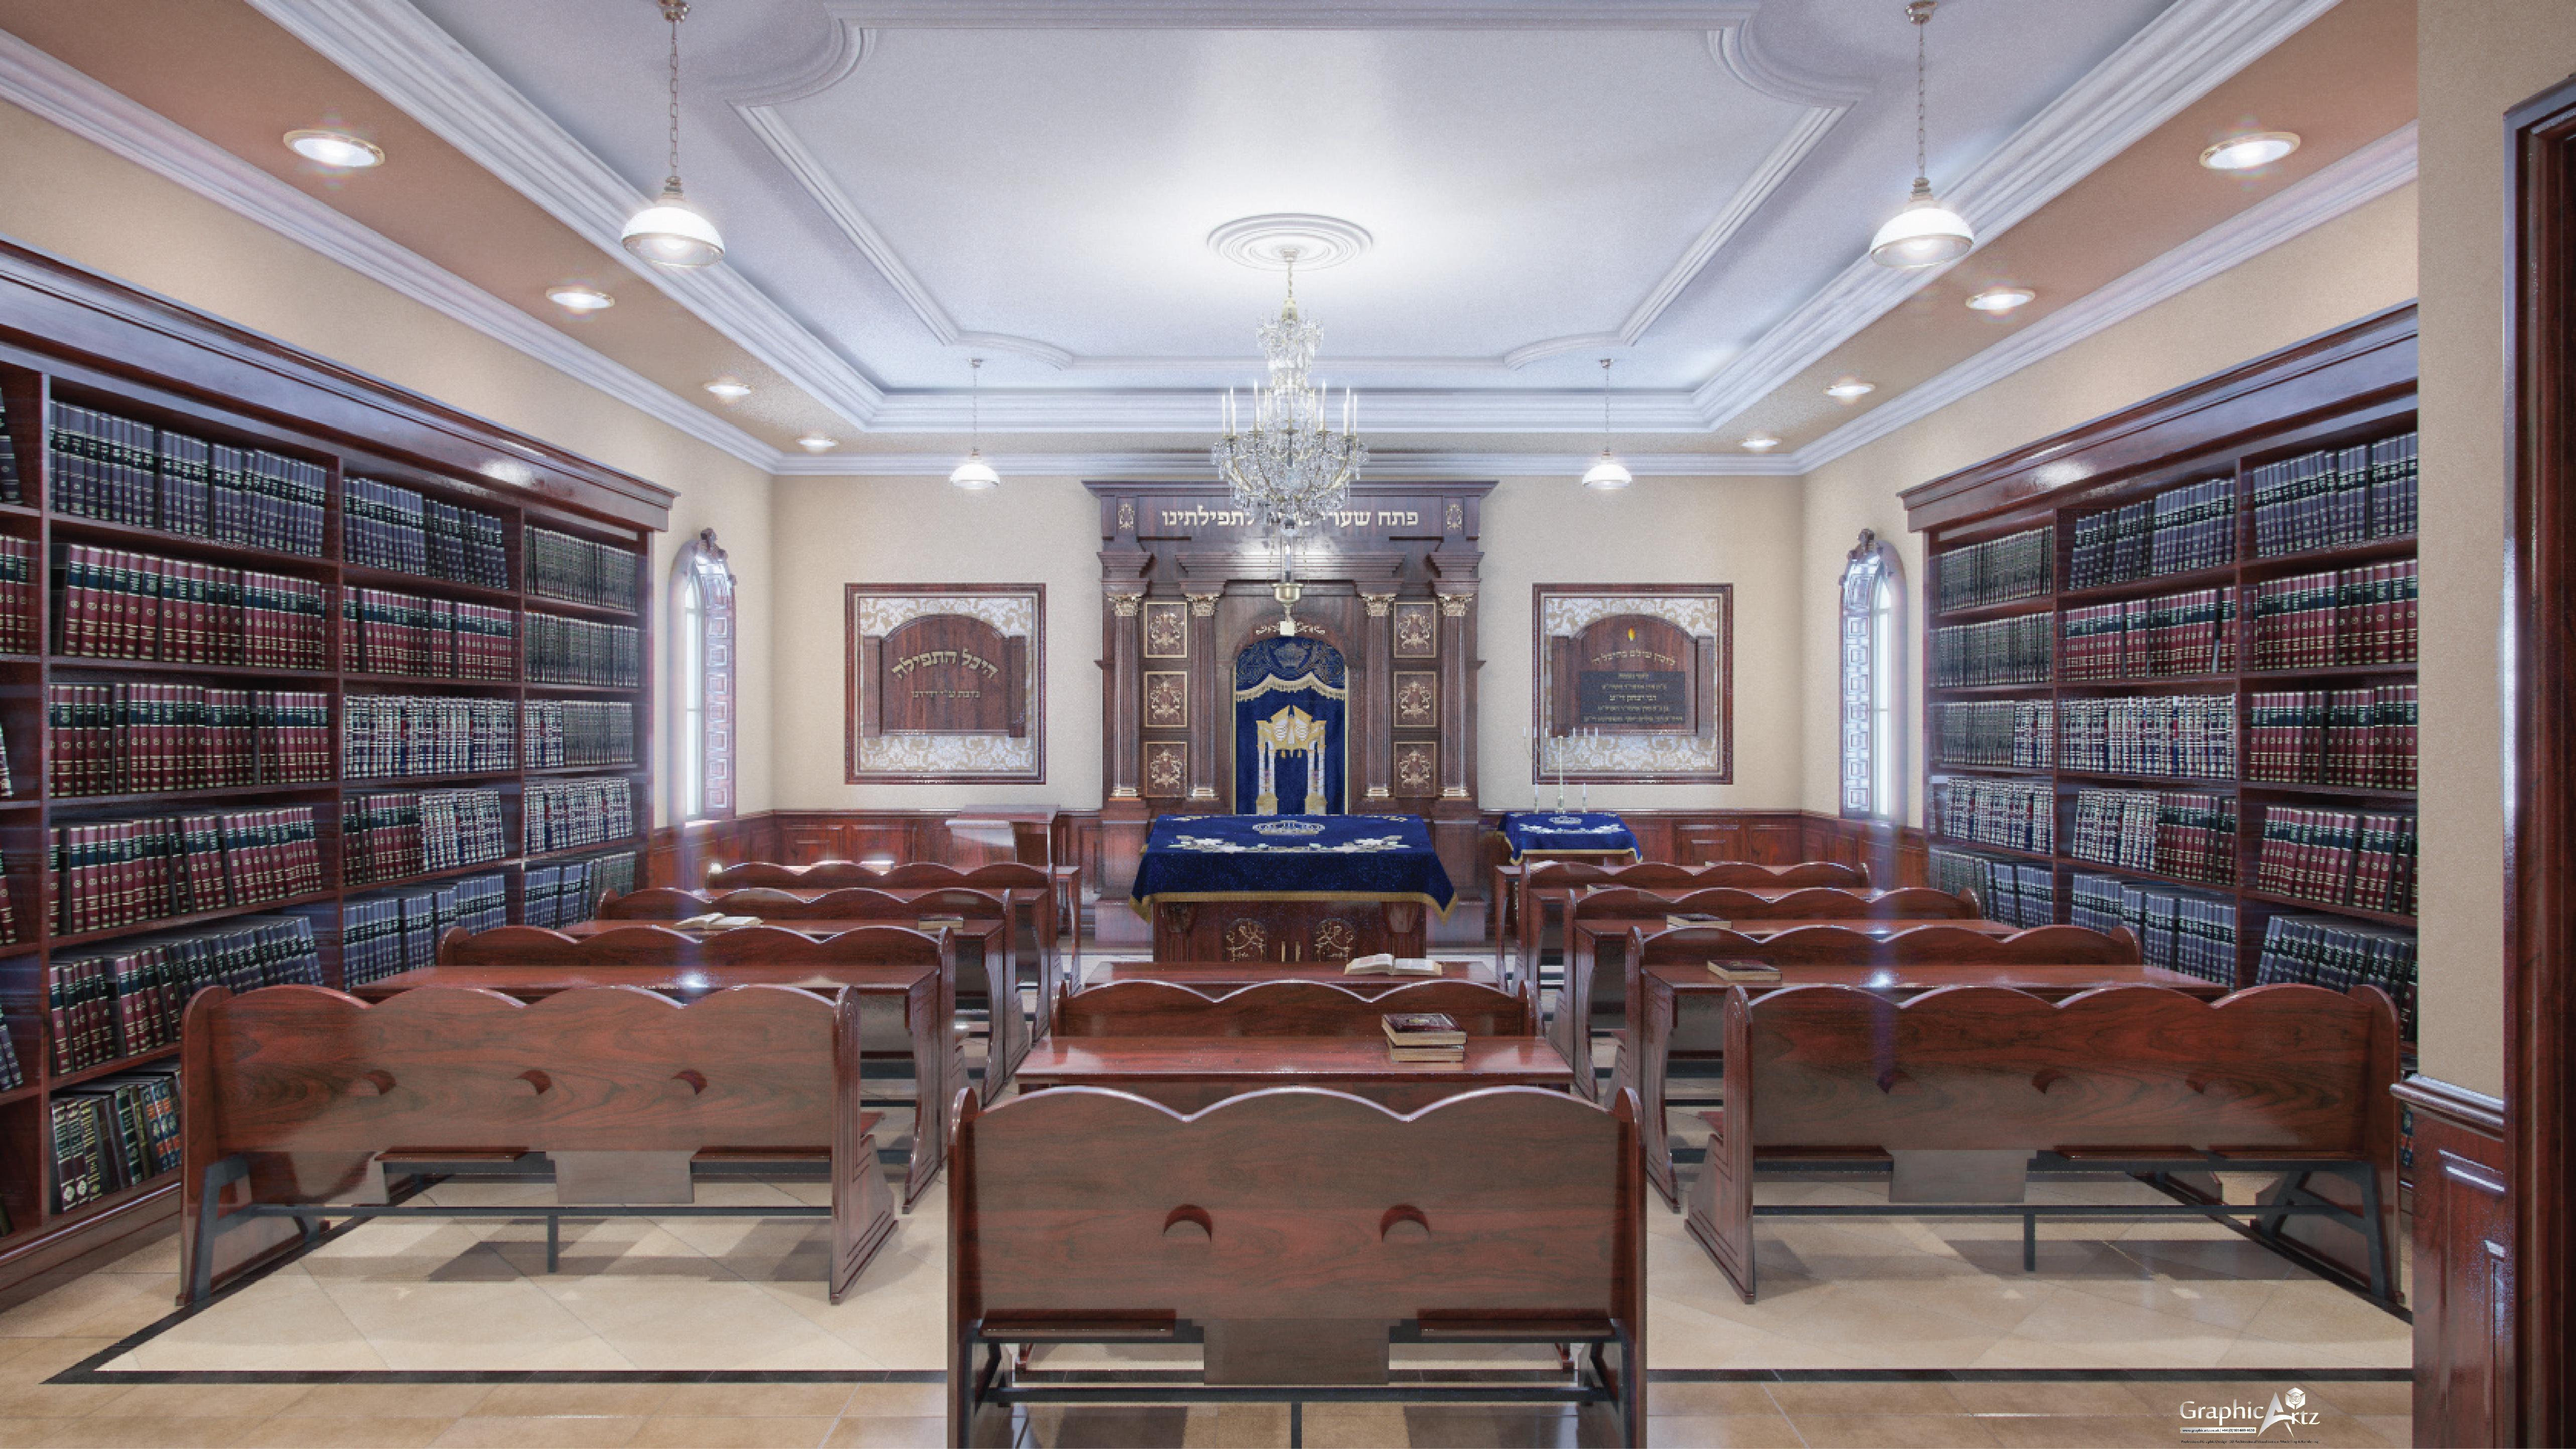 Buhush Beis Hamedrash Interior CGI veiw 2